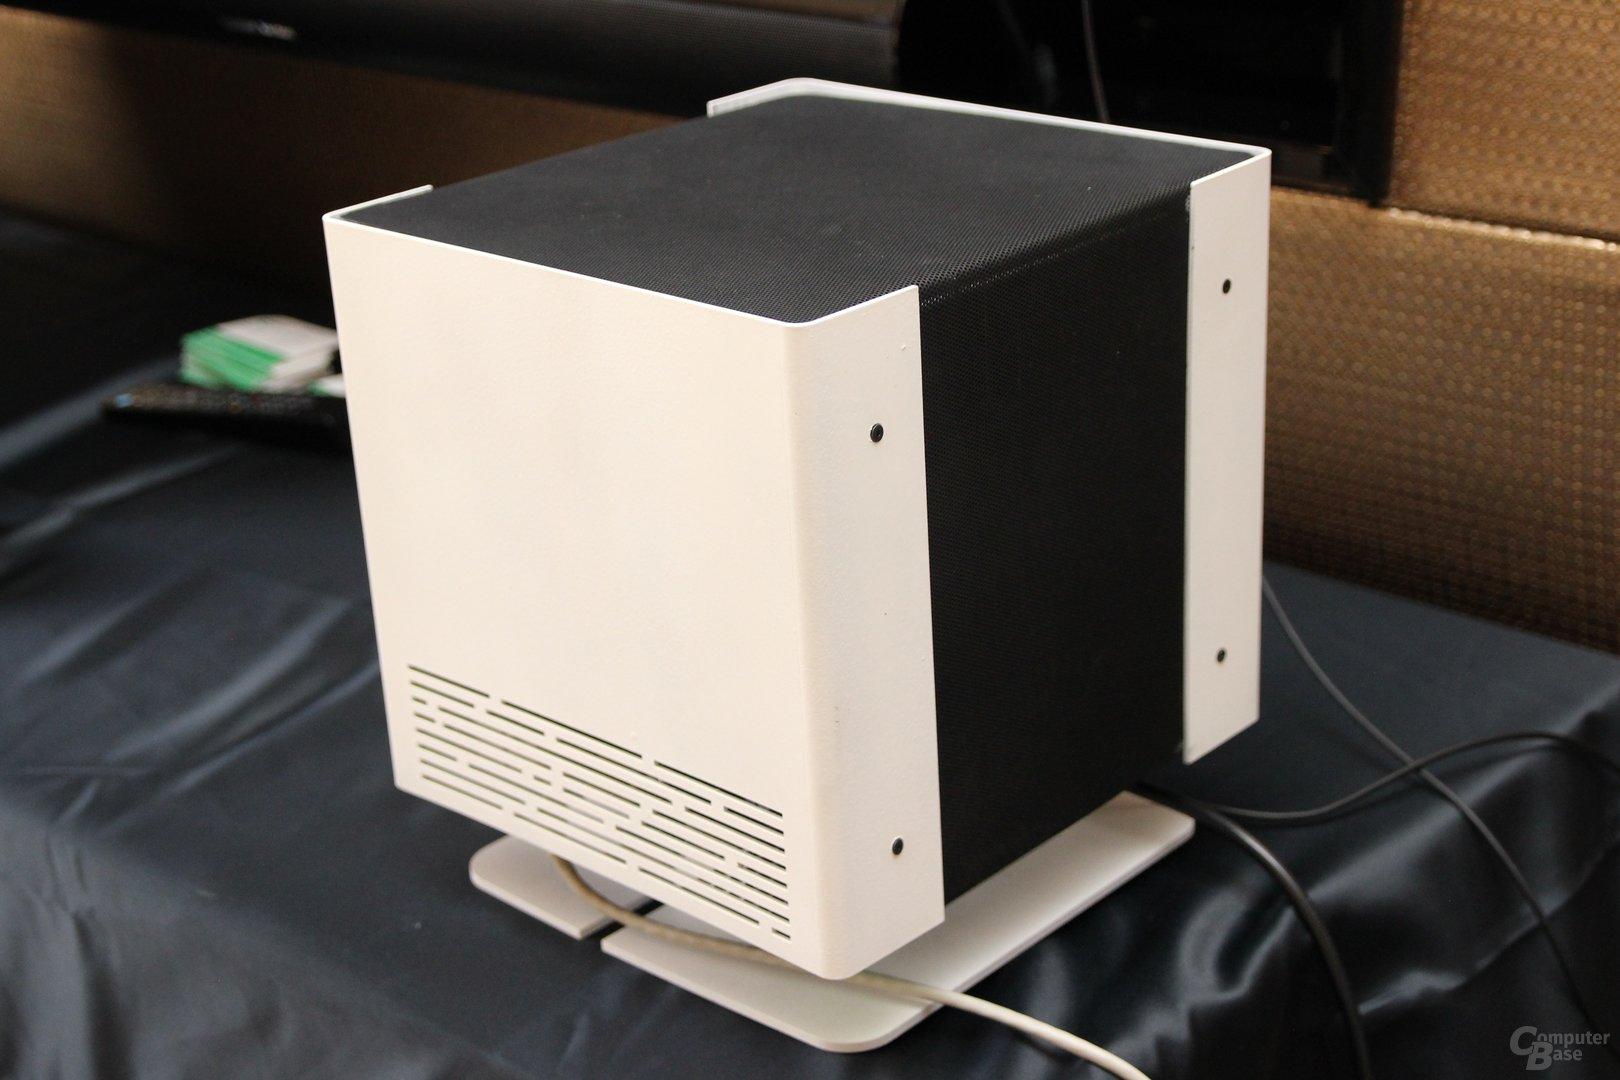 Noch namenloser Würfel kühlt passiv bis zu 200 Watt